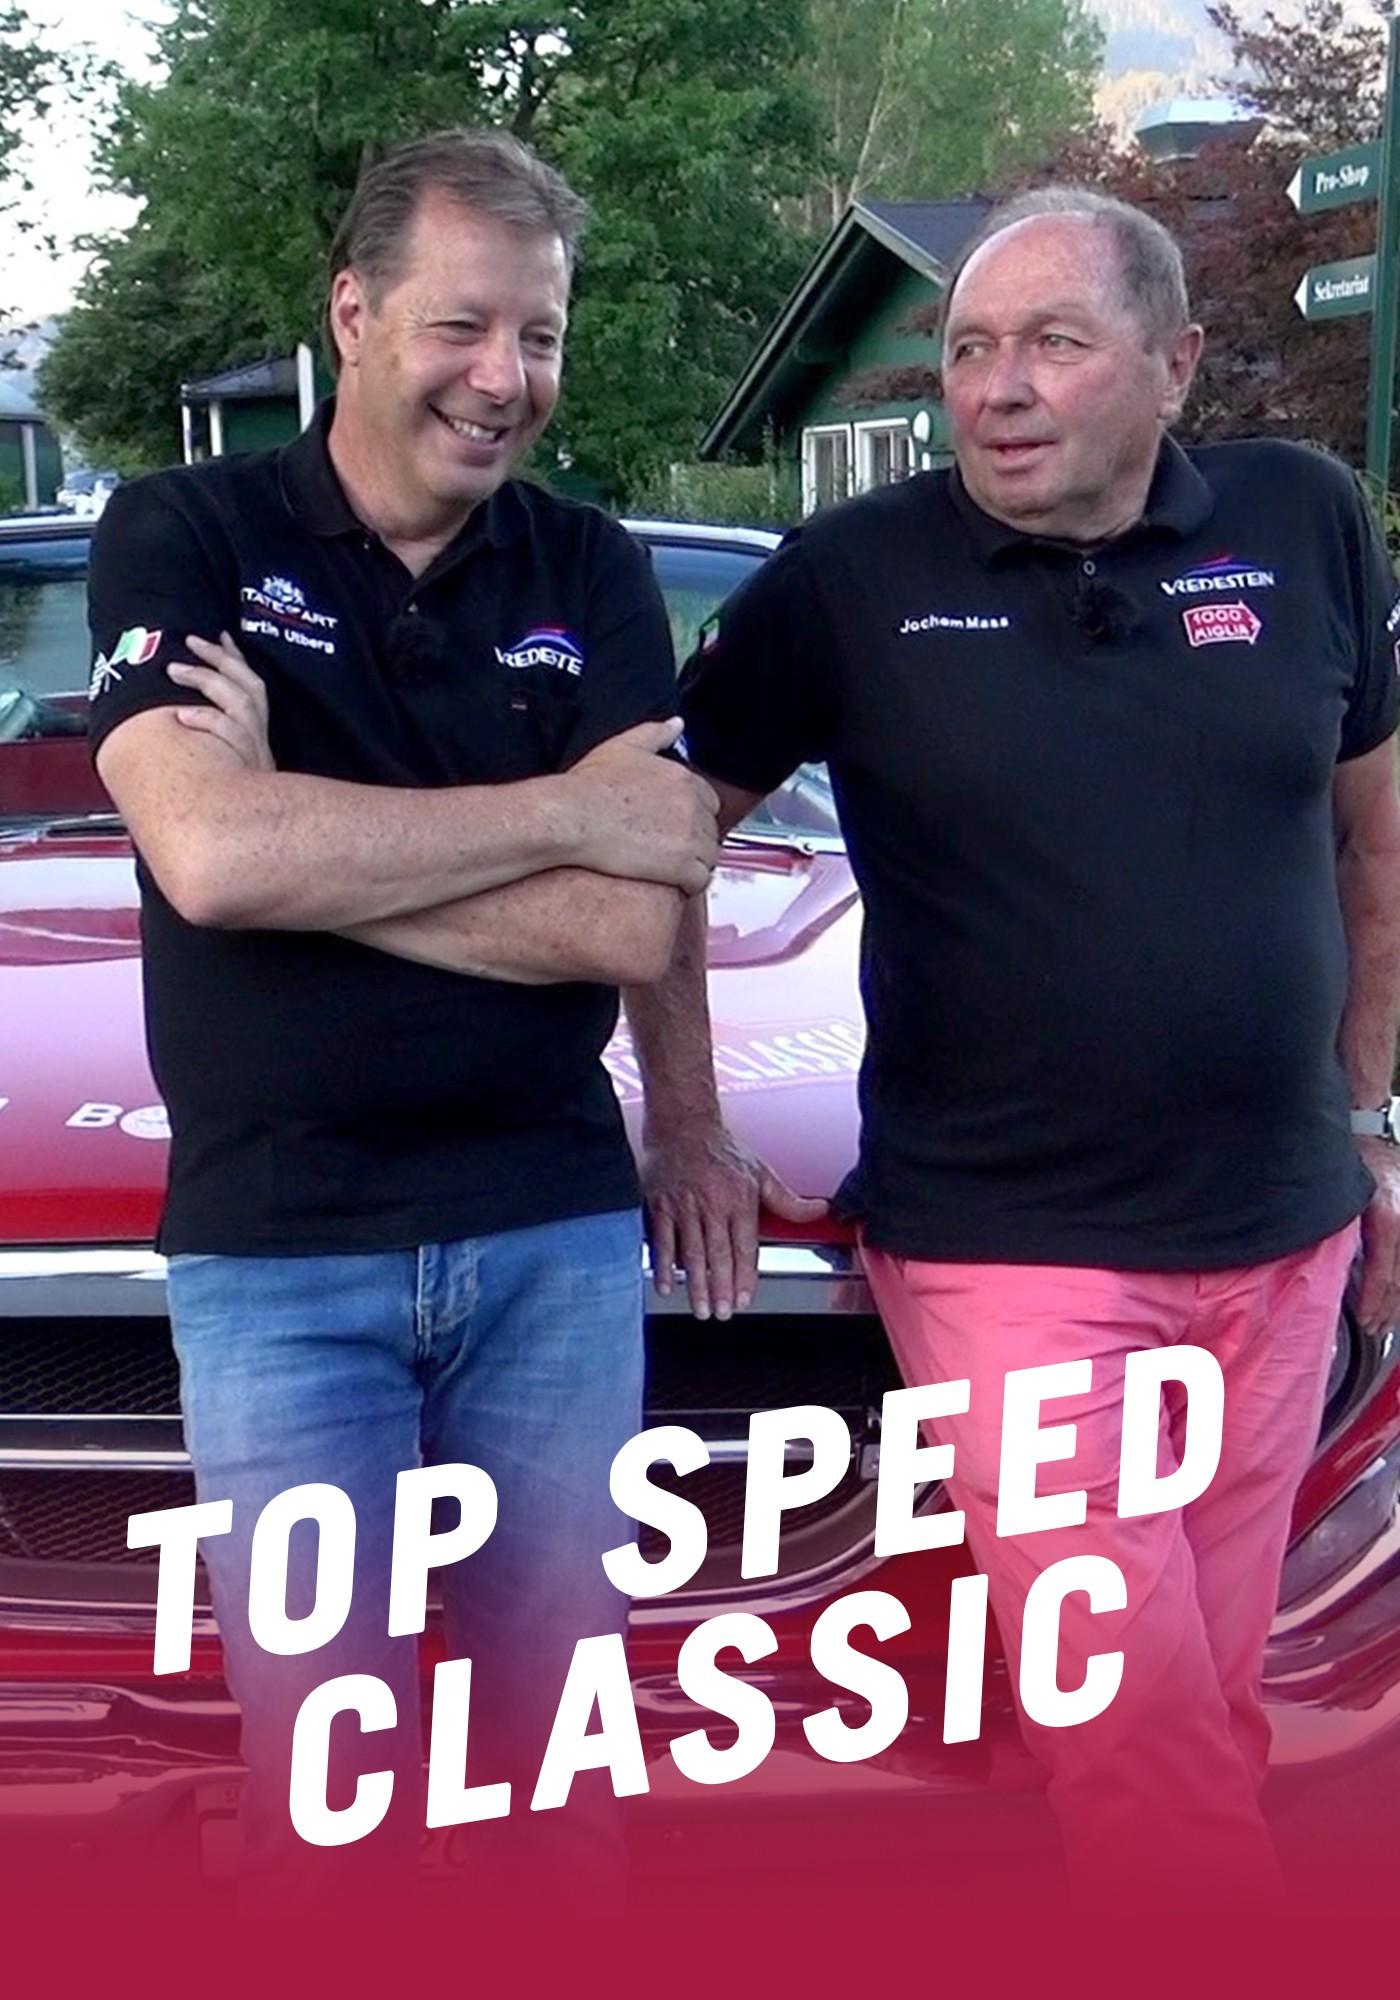 Top Speed Classic